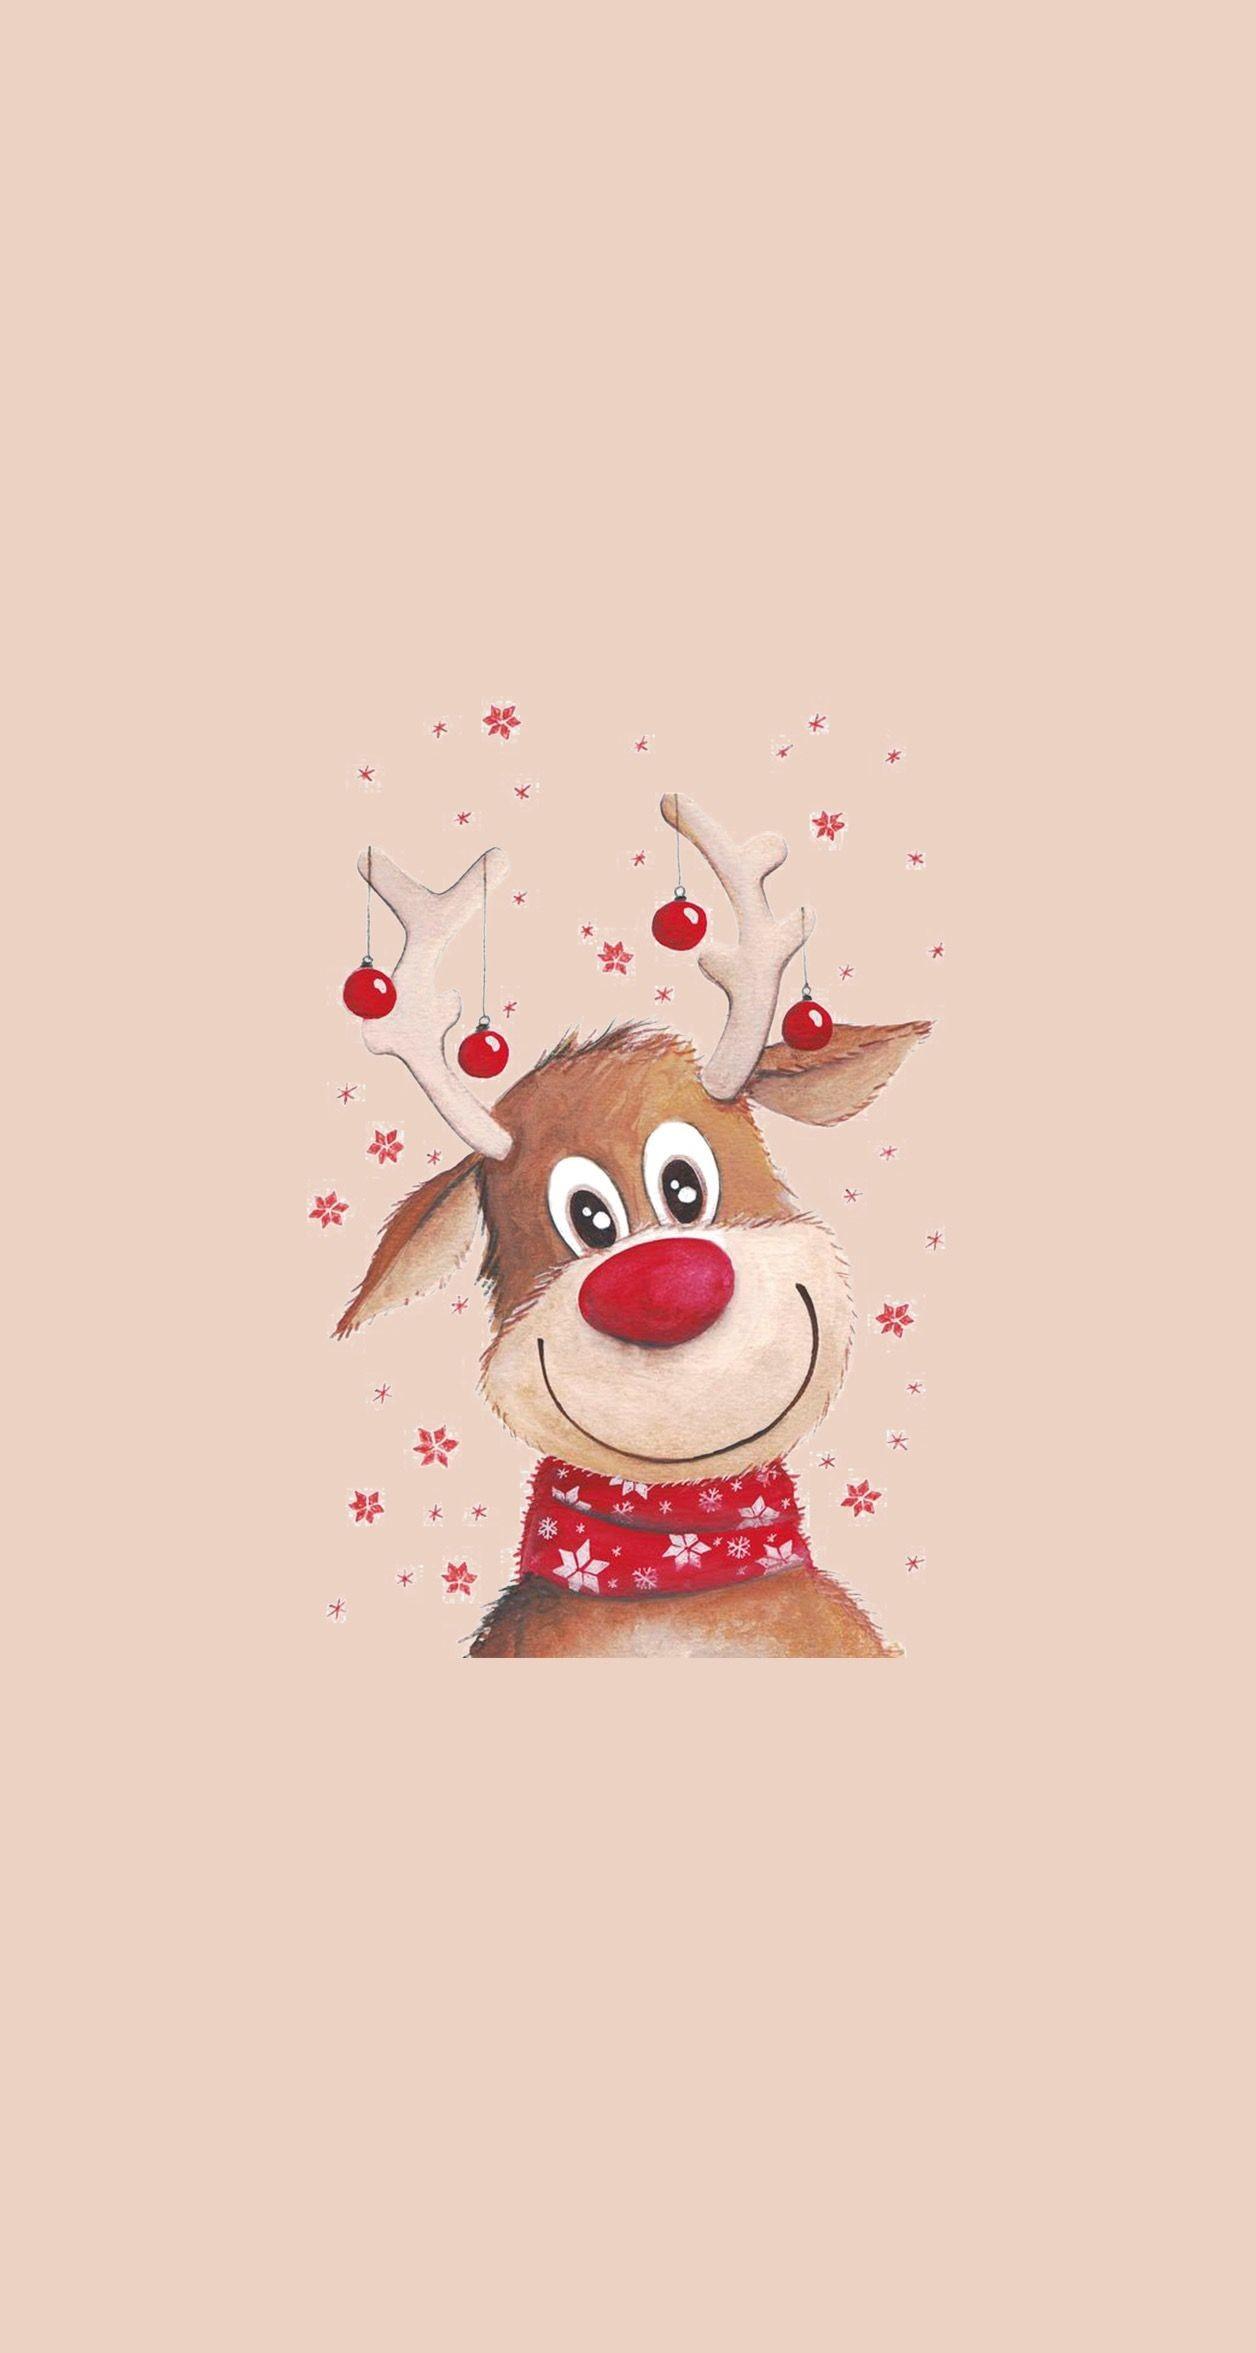 Cute Christmas Cute Reindeer Wallpaper Novocom Top